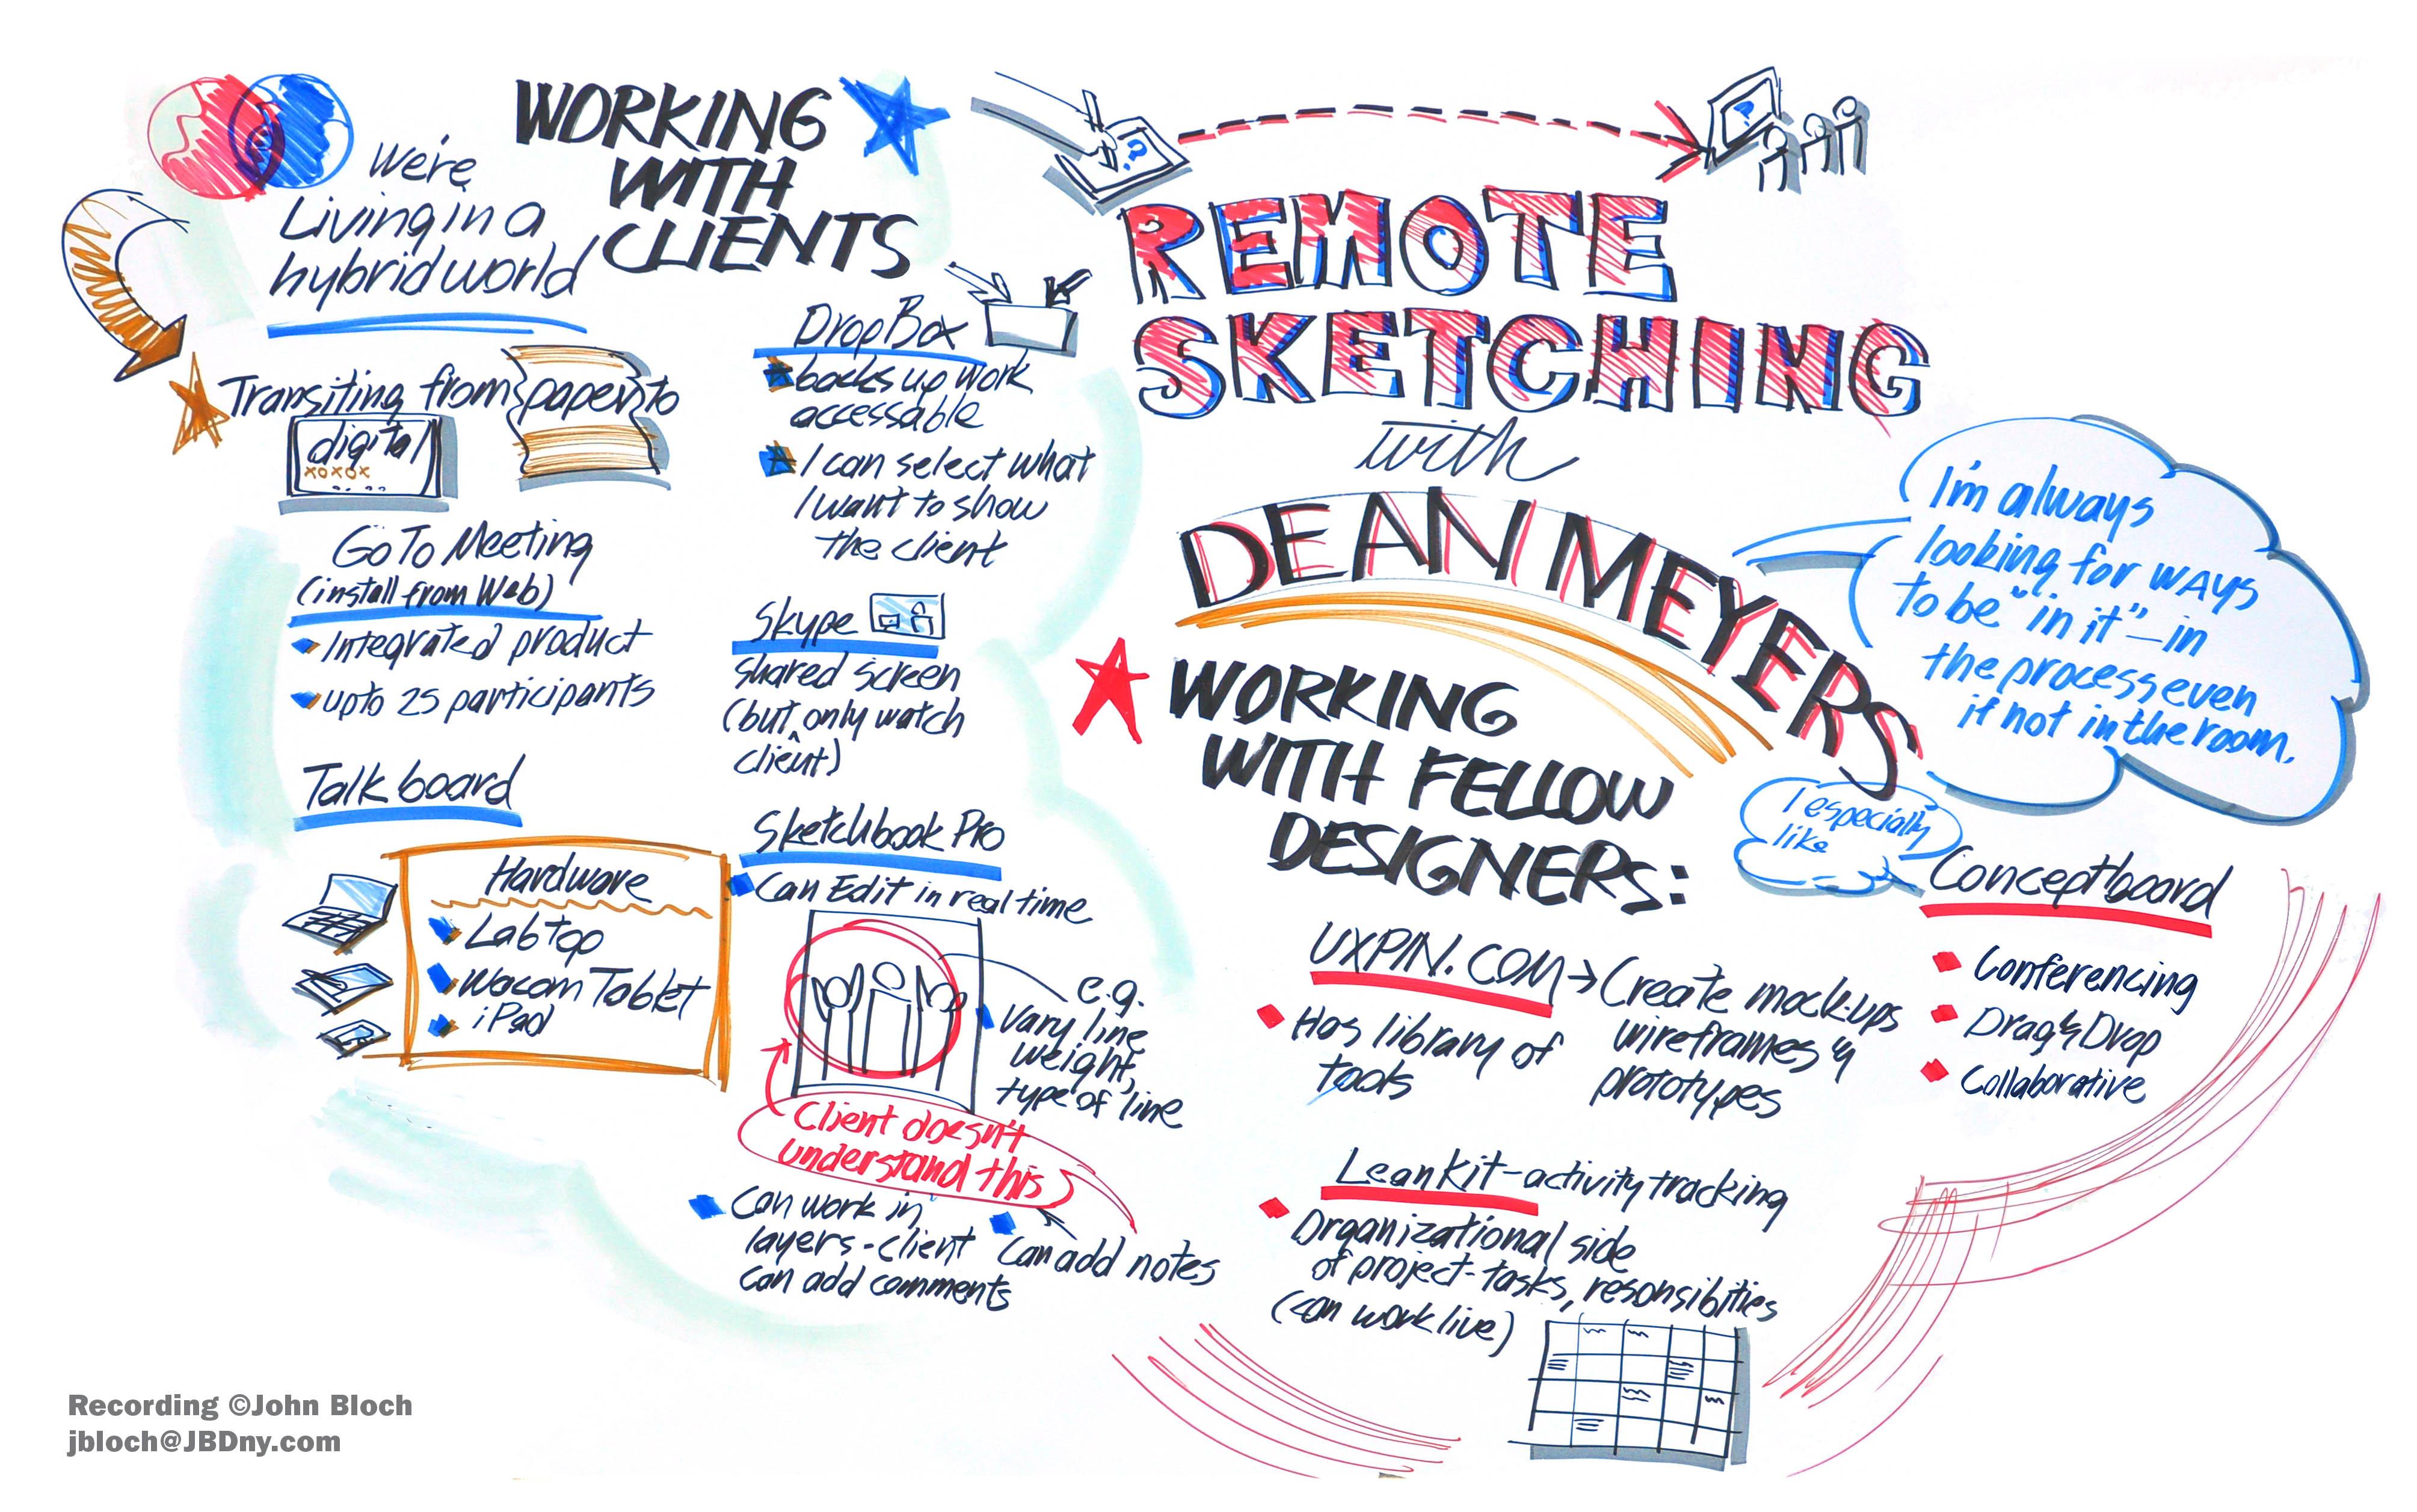 UX Sketchcamp - remote sketching - Meyers